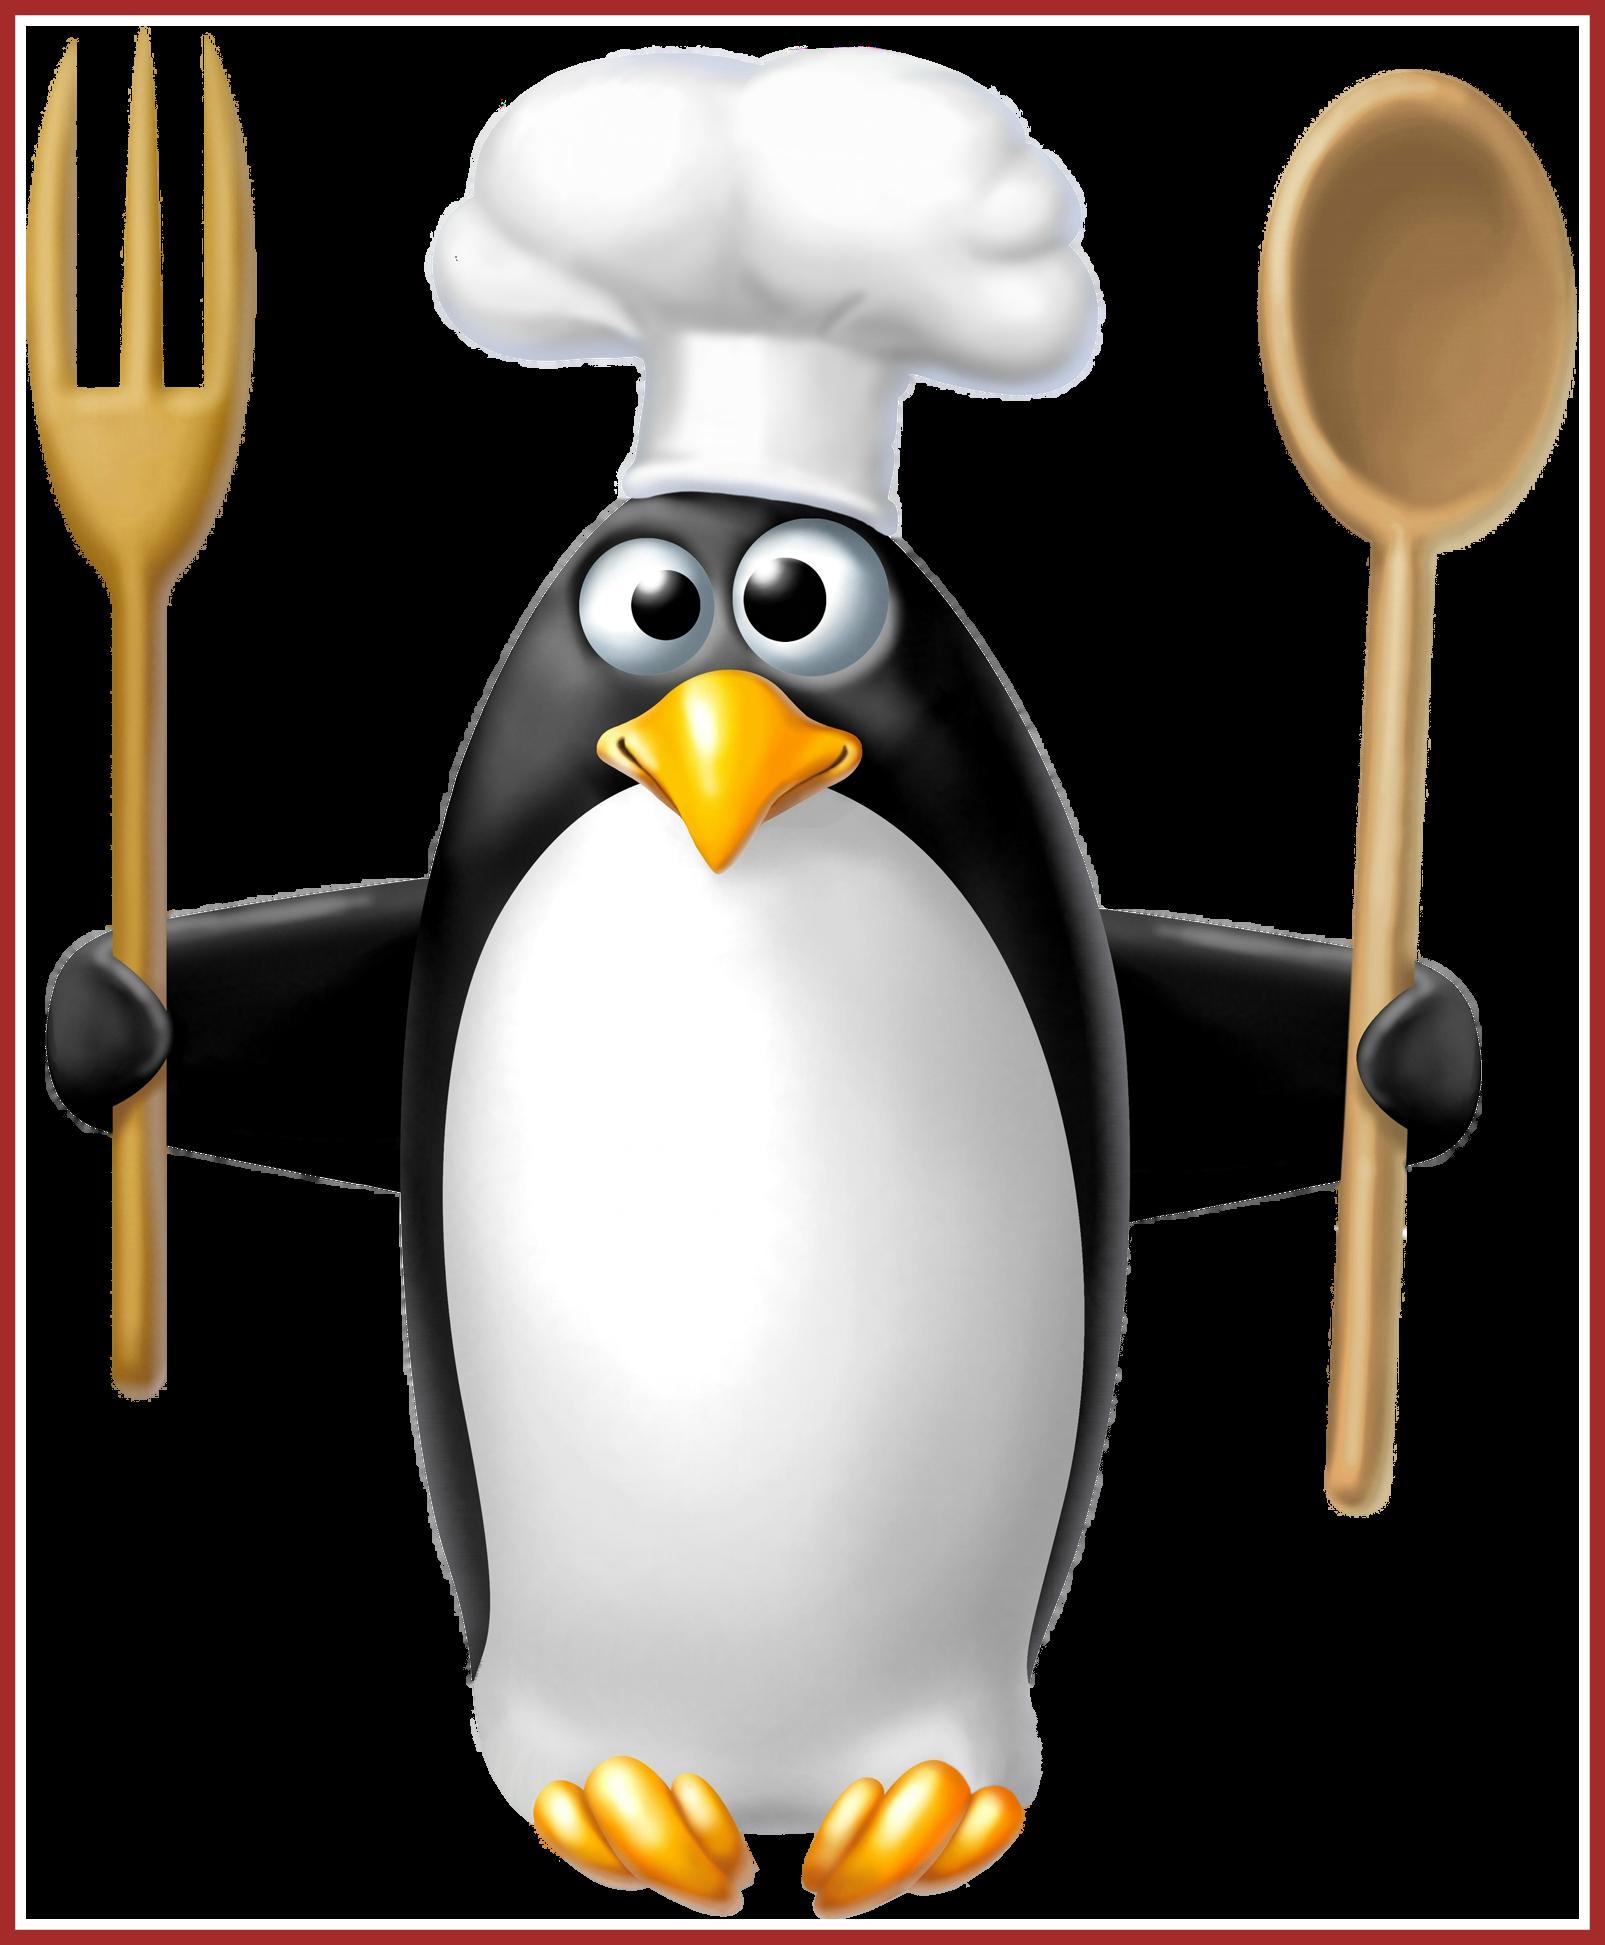 Halloween penguin clipart image library stock Marvelous Corujas Minus Felt Holidays Easter Halloween Valentines ... image library stock